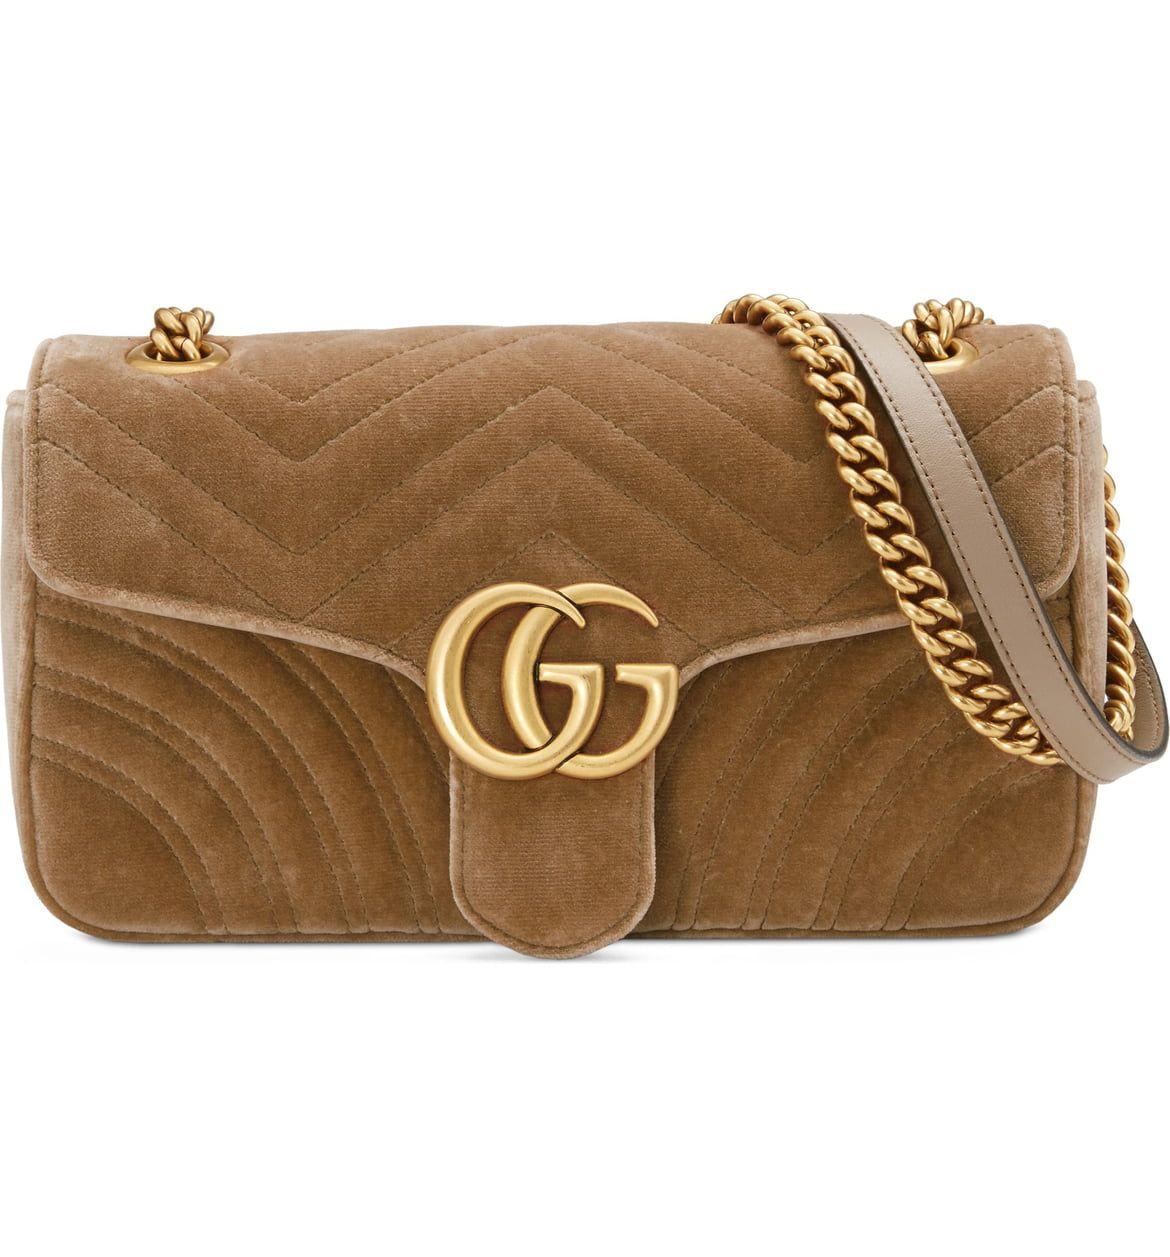 881287bae72b Gucci Medium GG Marmont 2.0 Matelassé Velvet Shoulder Bag in Taupe |  Nordstrom